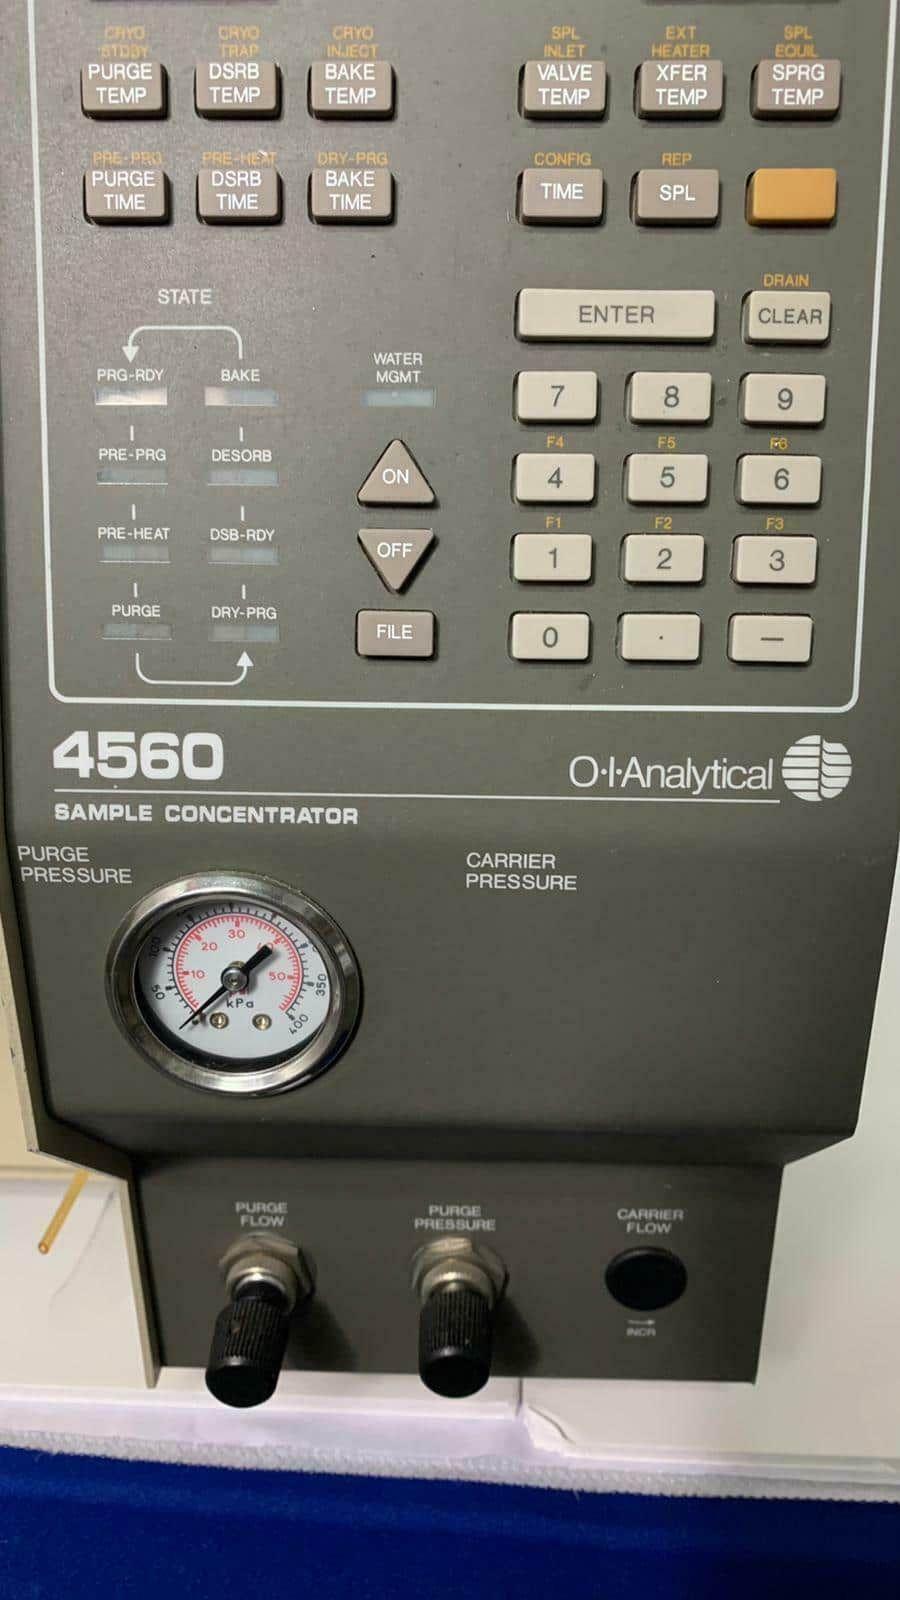 O.I. Analytical 4560 Sample Concentrator